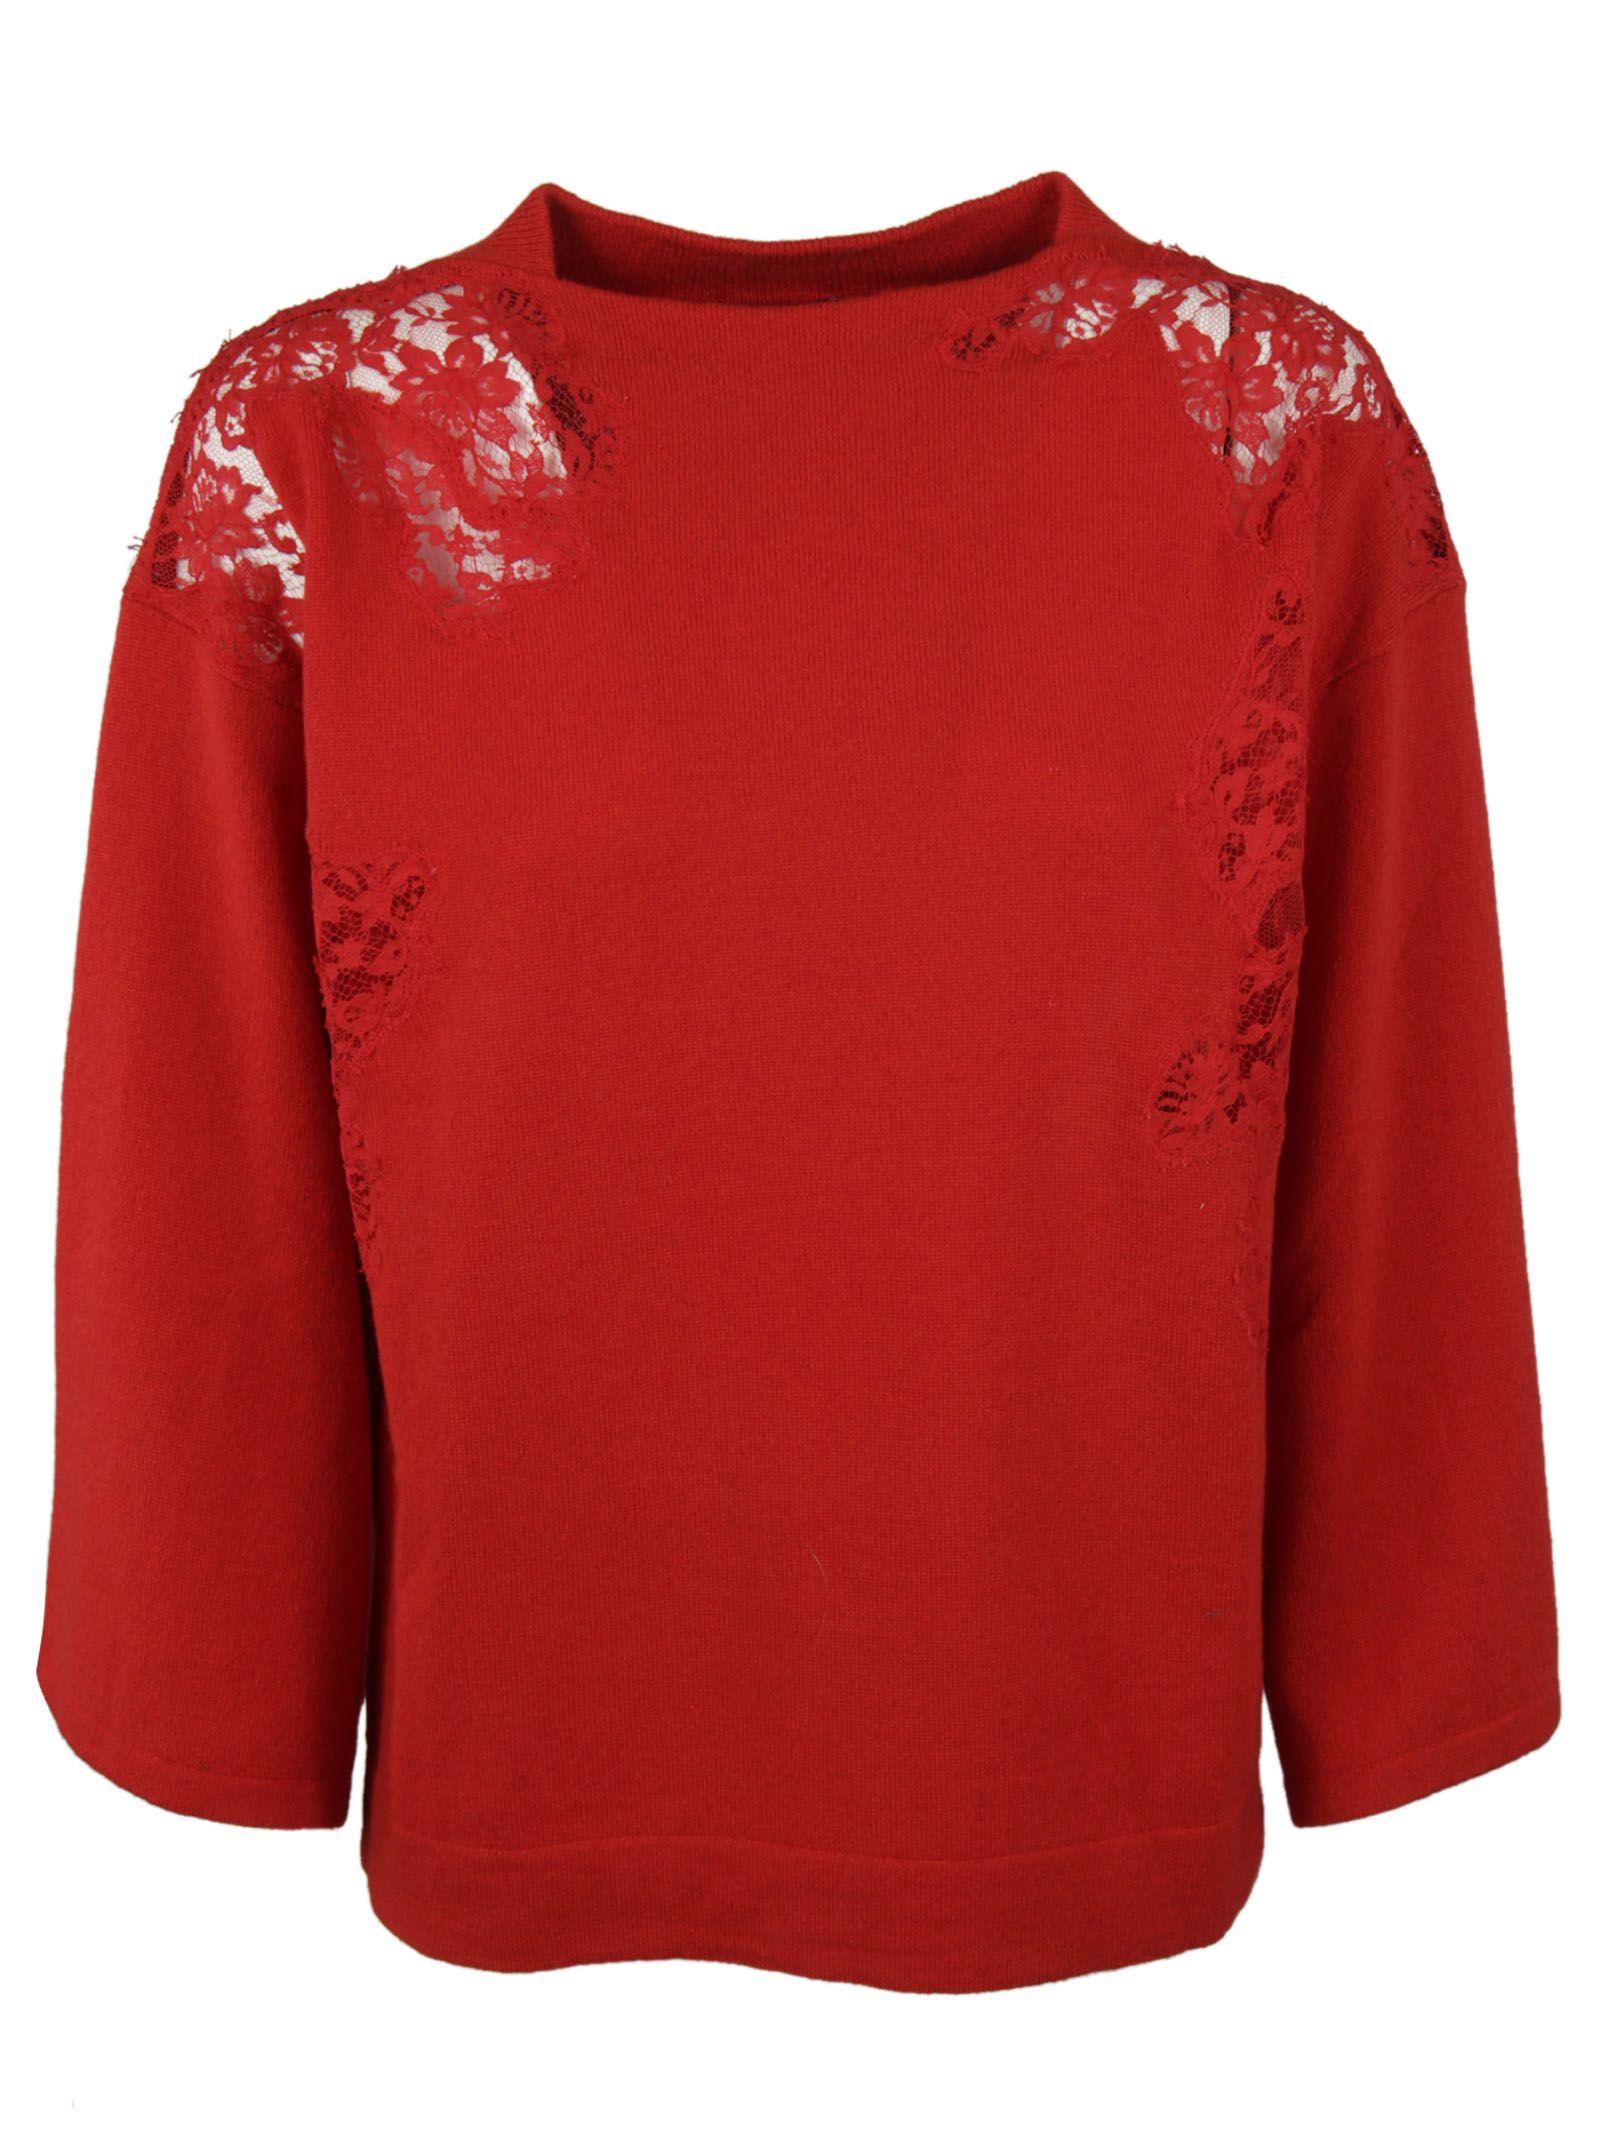 Ermanno Ermanno Scervino See-Through Shoulder Sweatshirt